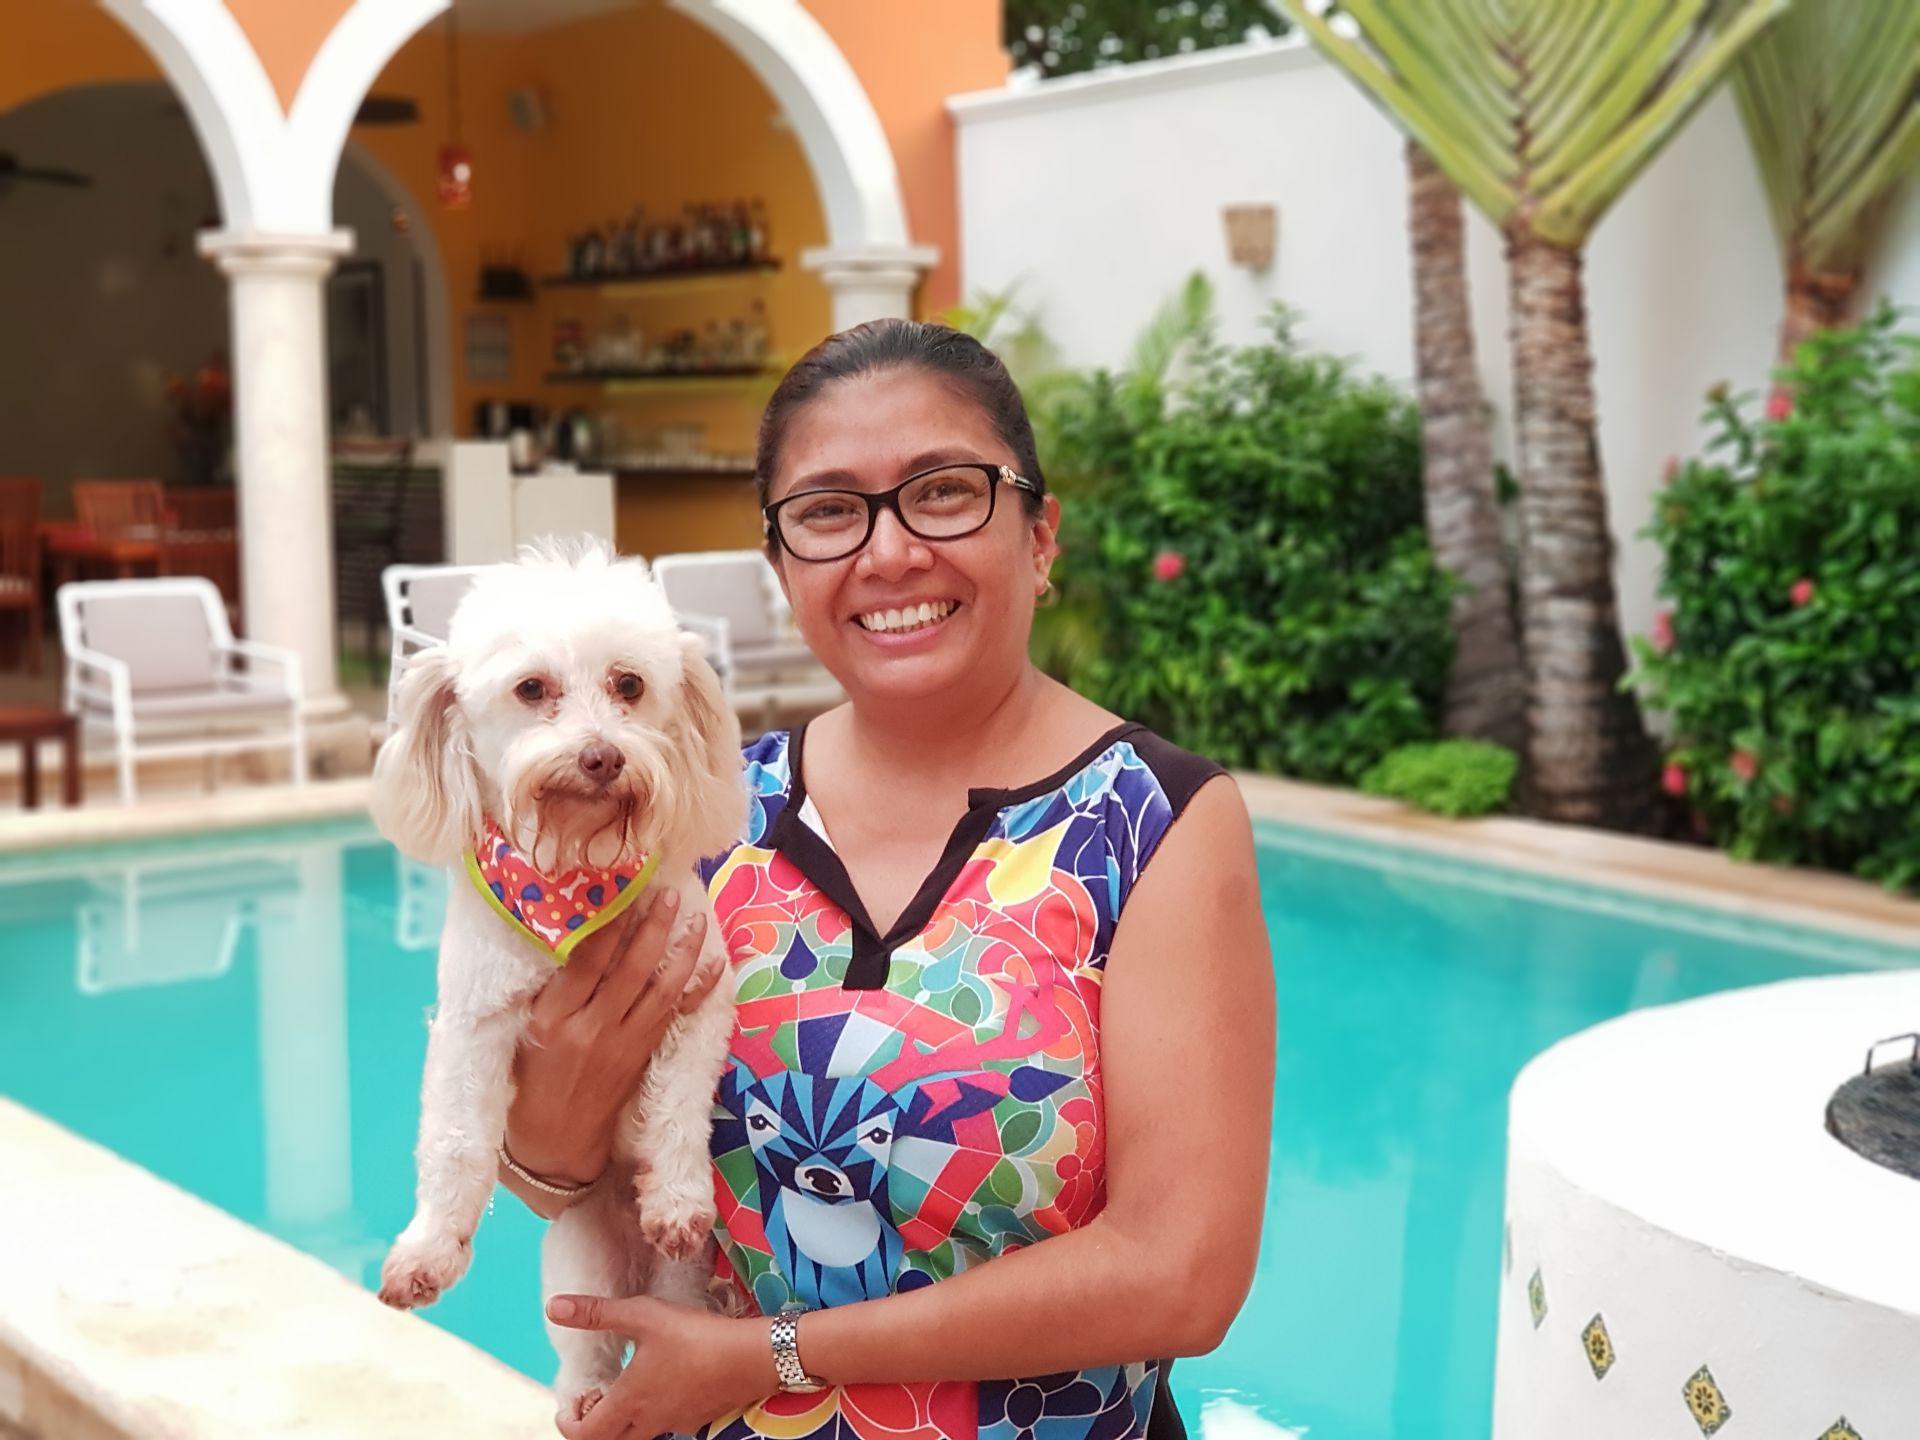 Merida Santiago Boutique Hotel fashionistatravel experience